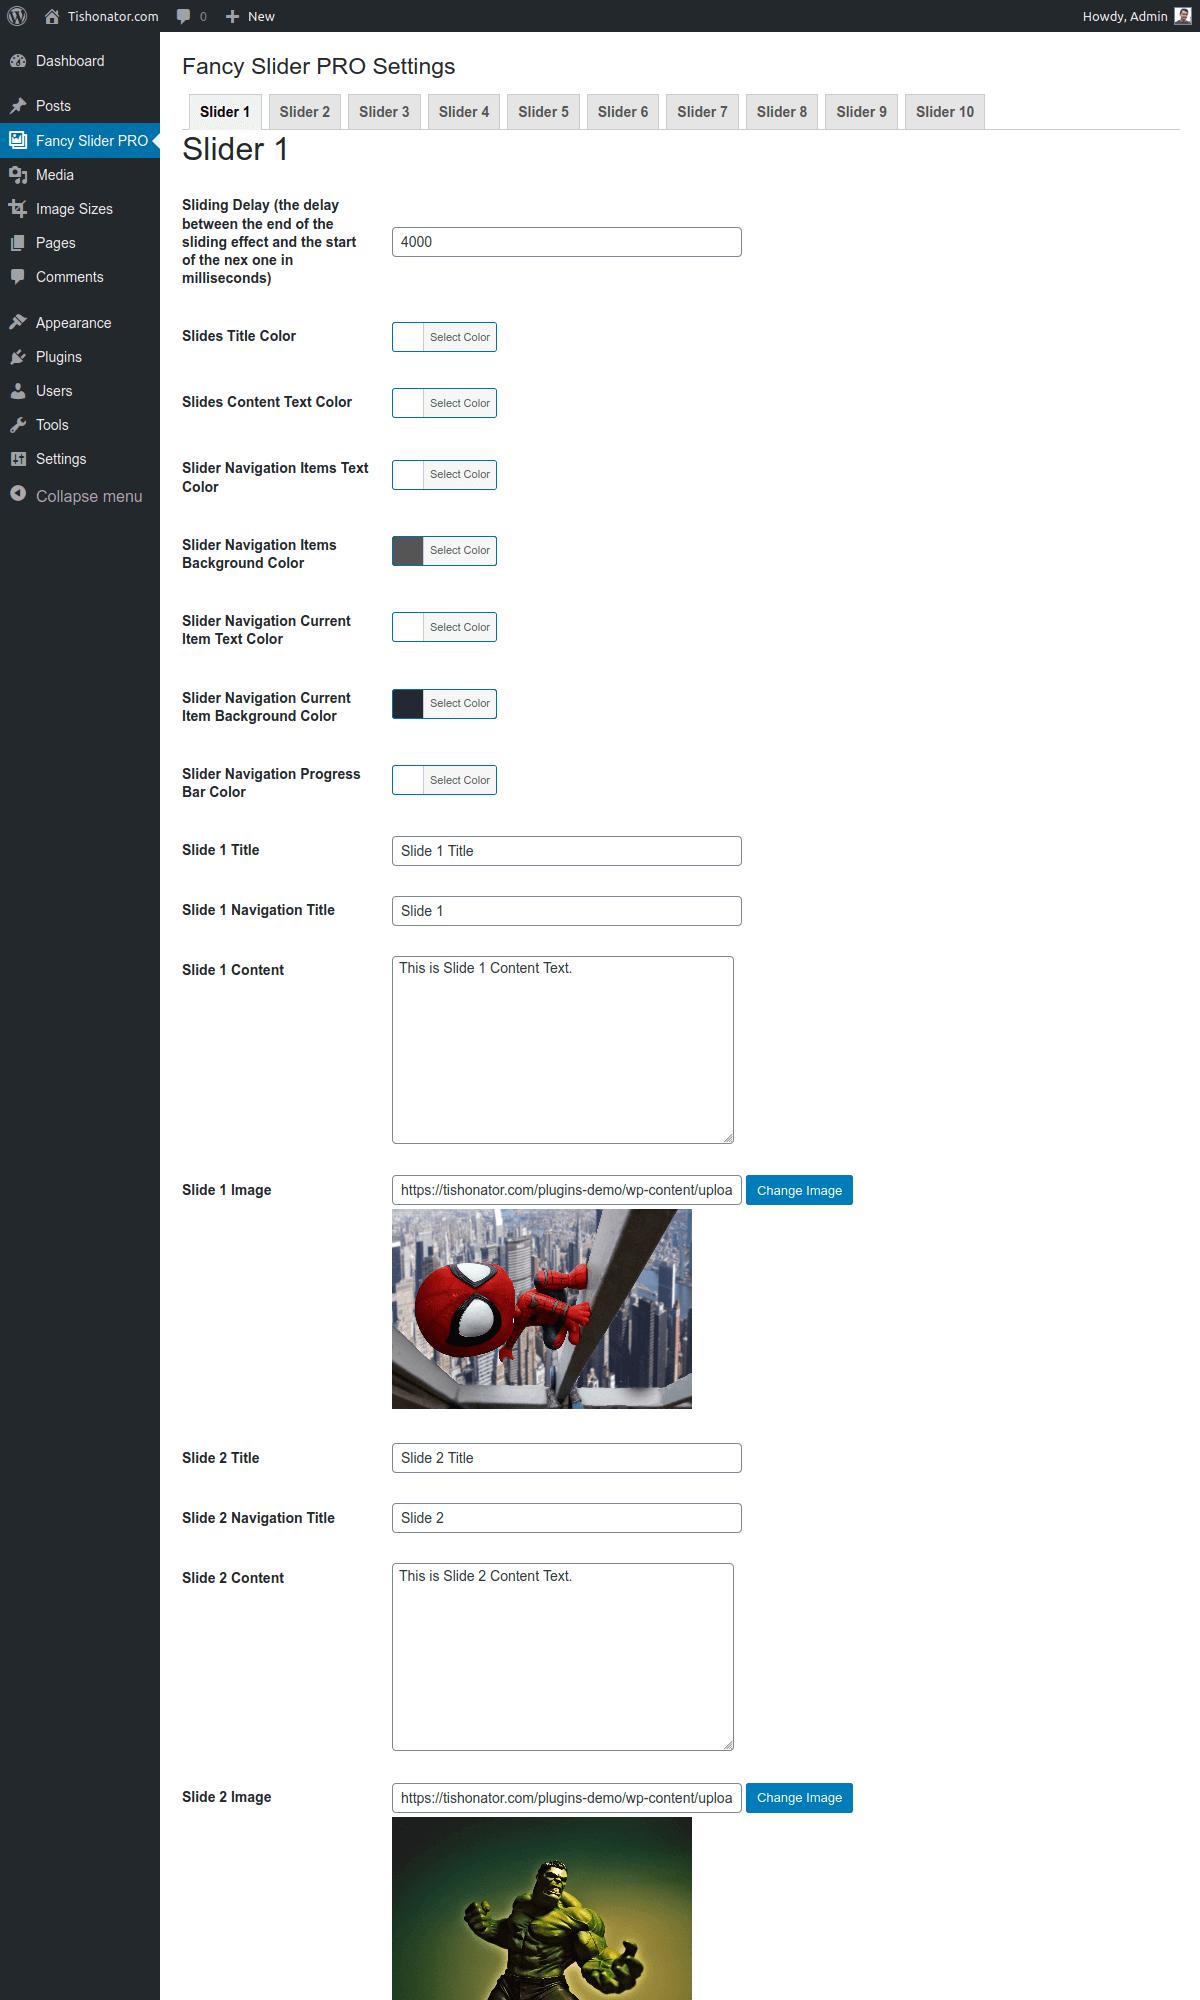 Fancy Slider Pro Admin Settings